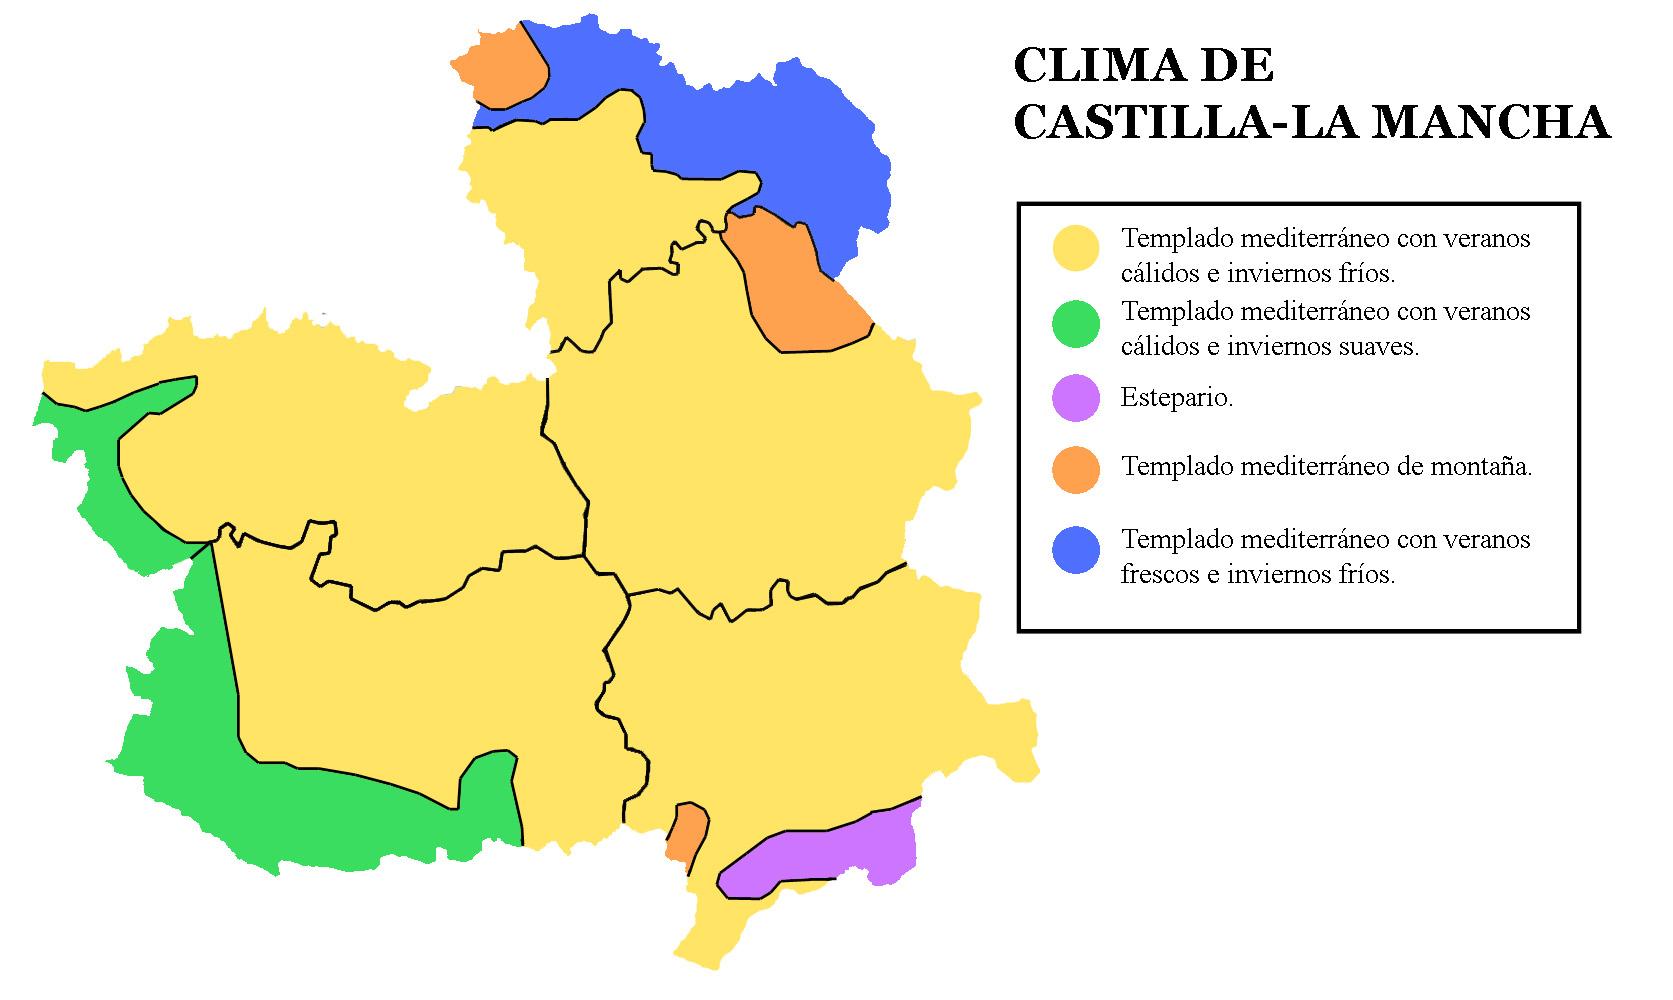 Climates of Castile-La Mancha 2007